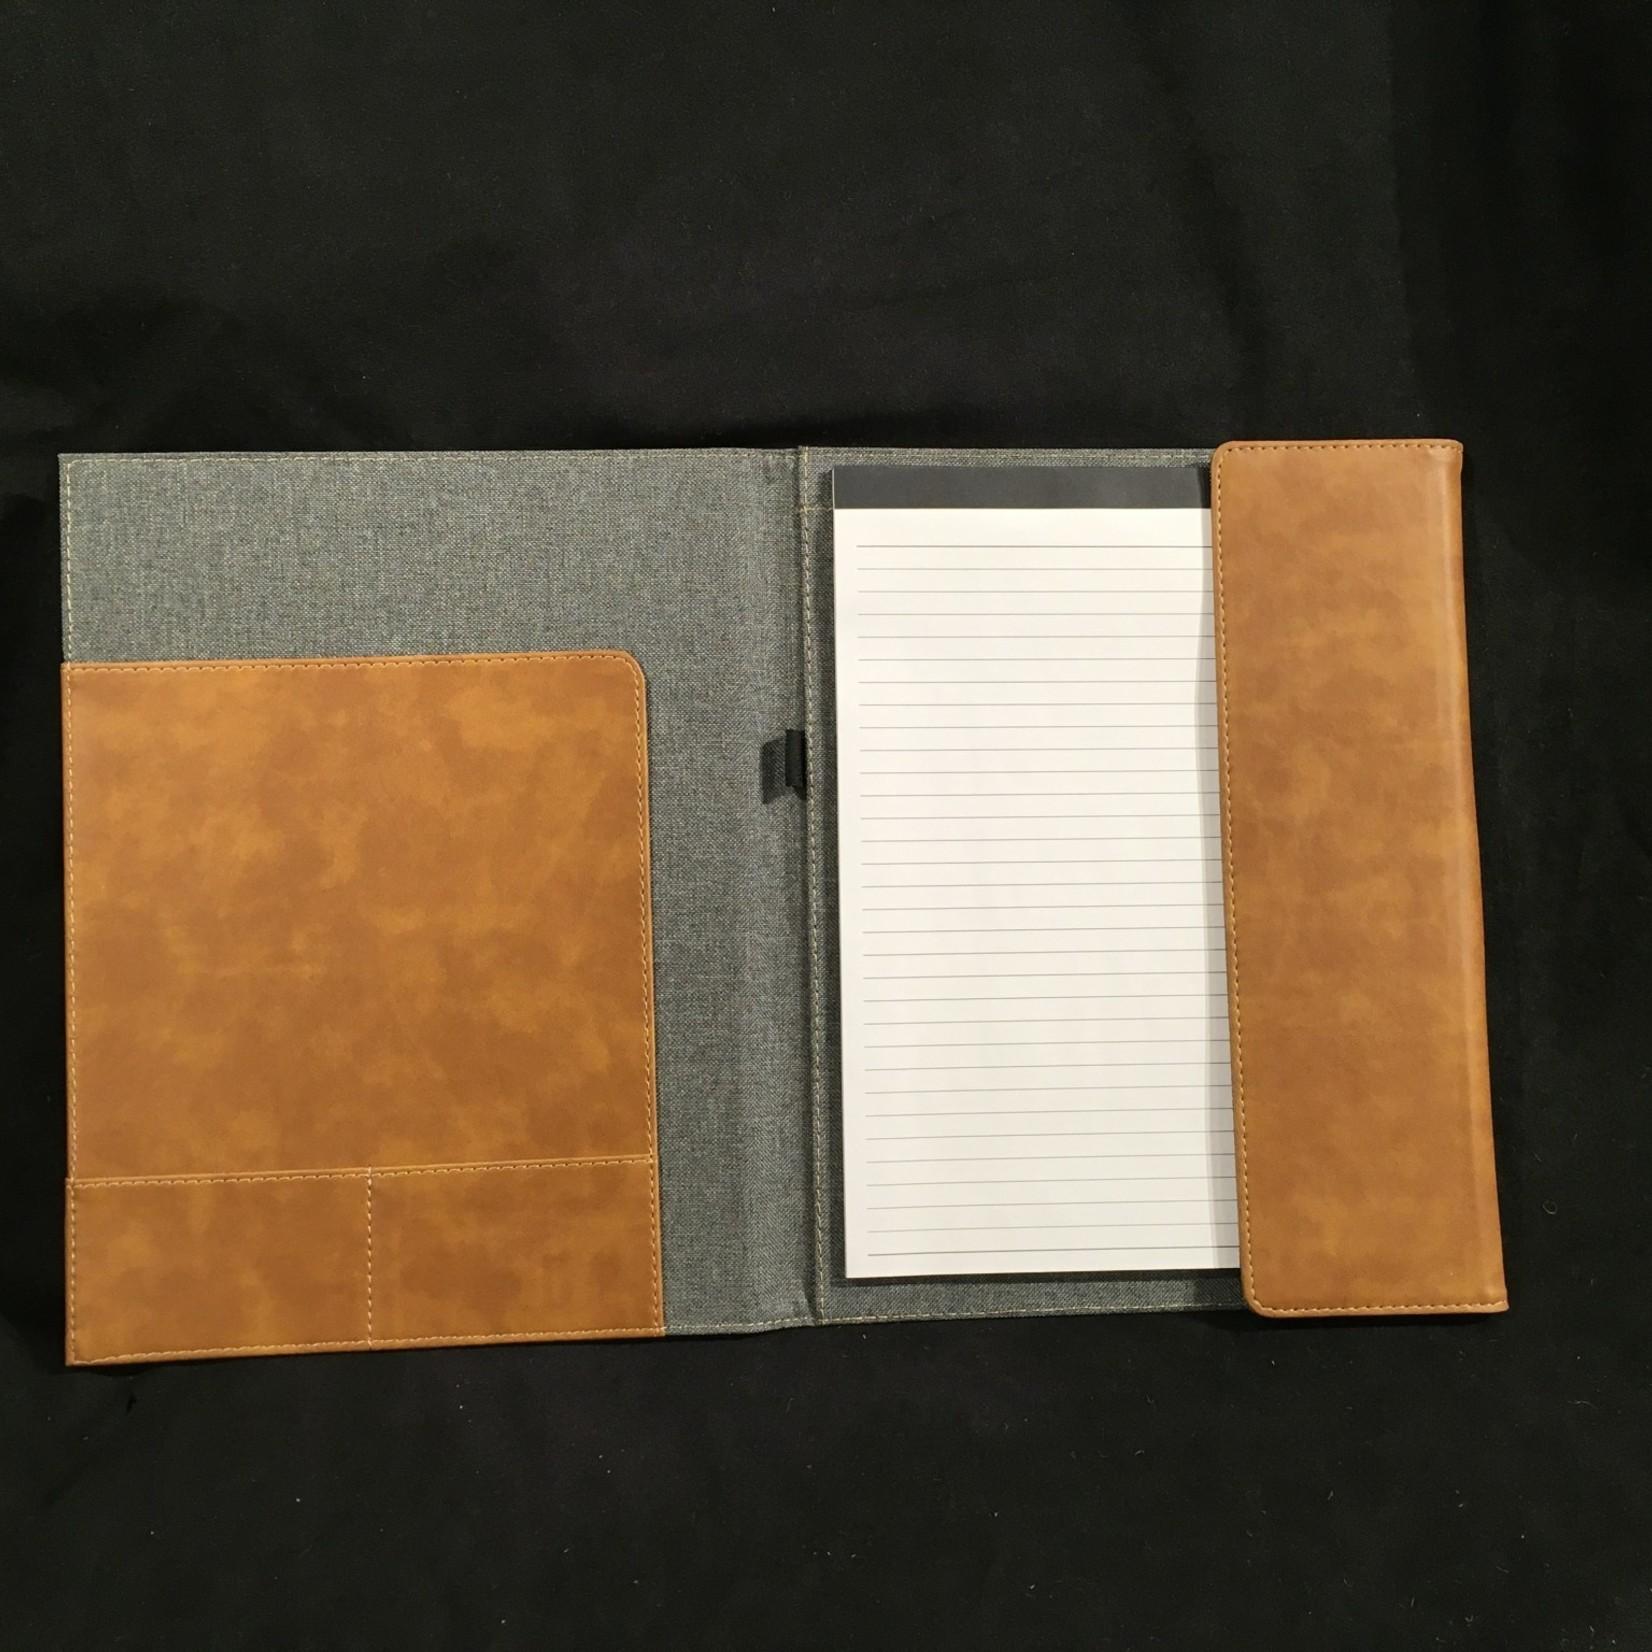 "Gray & Tan Padfolio (Large) 10x12.5"""